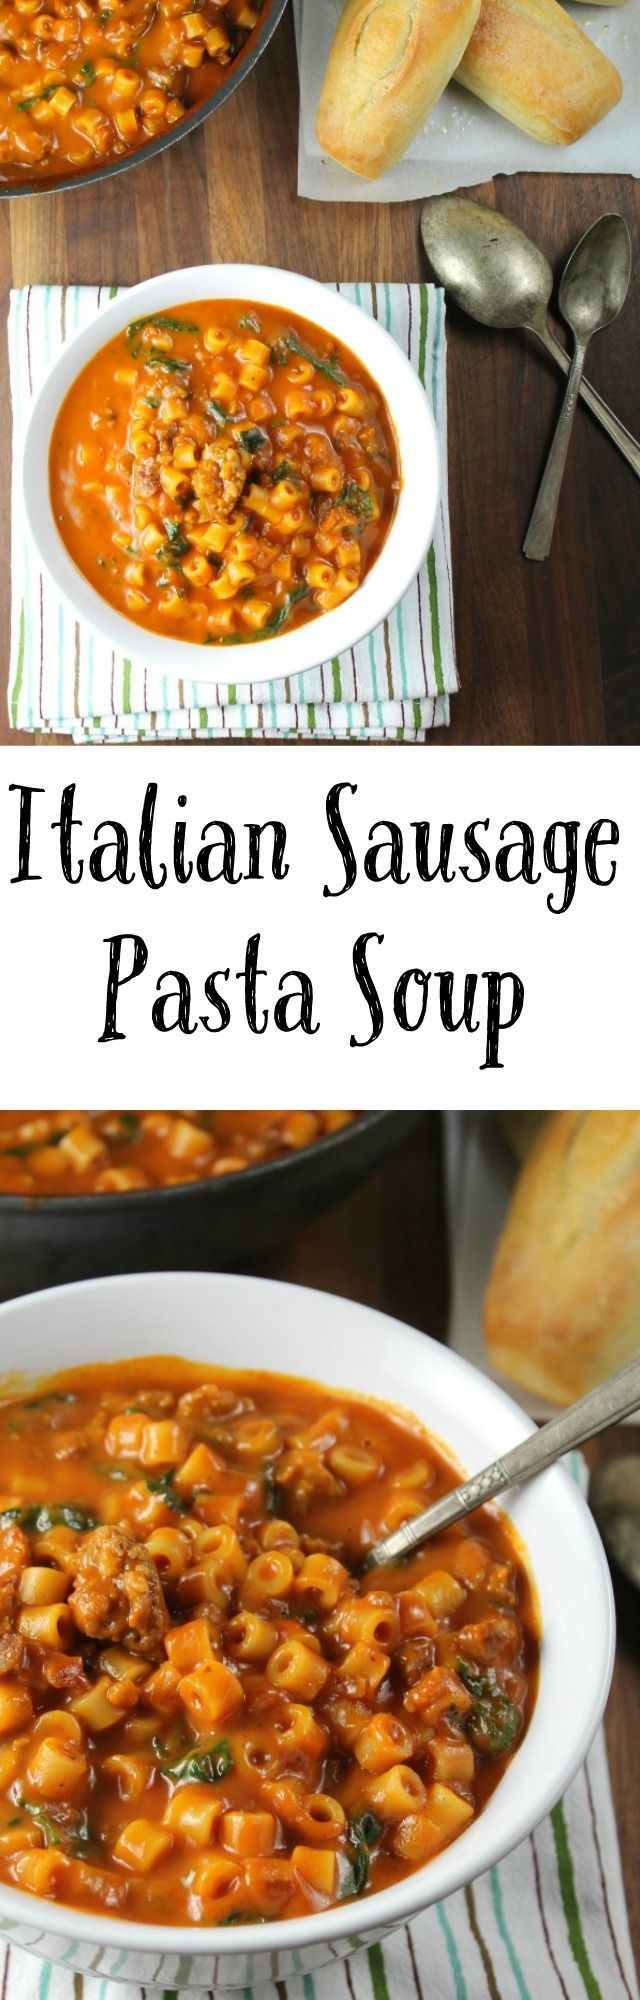 Italian Sausage Pasta Soup Recipe